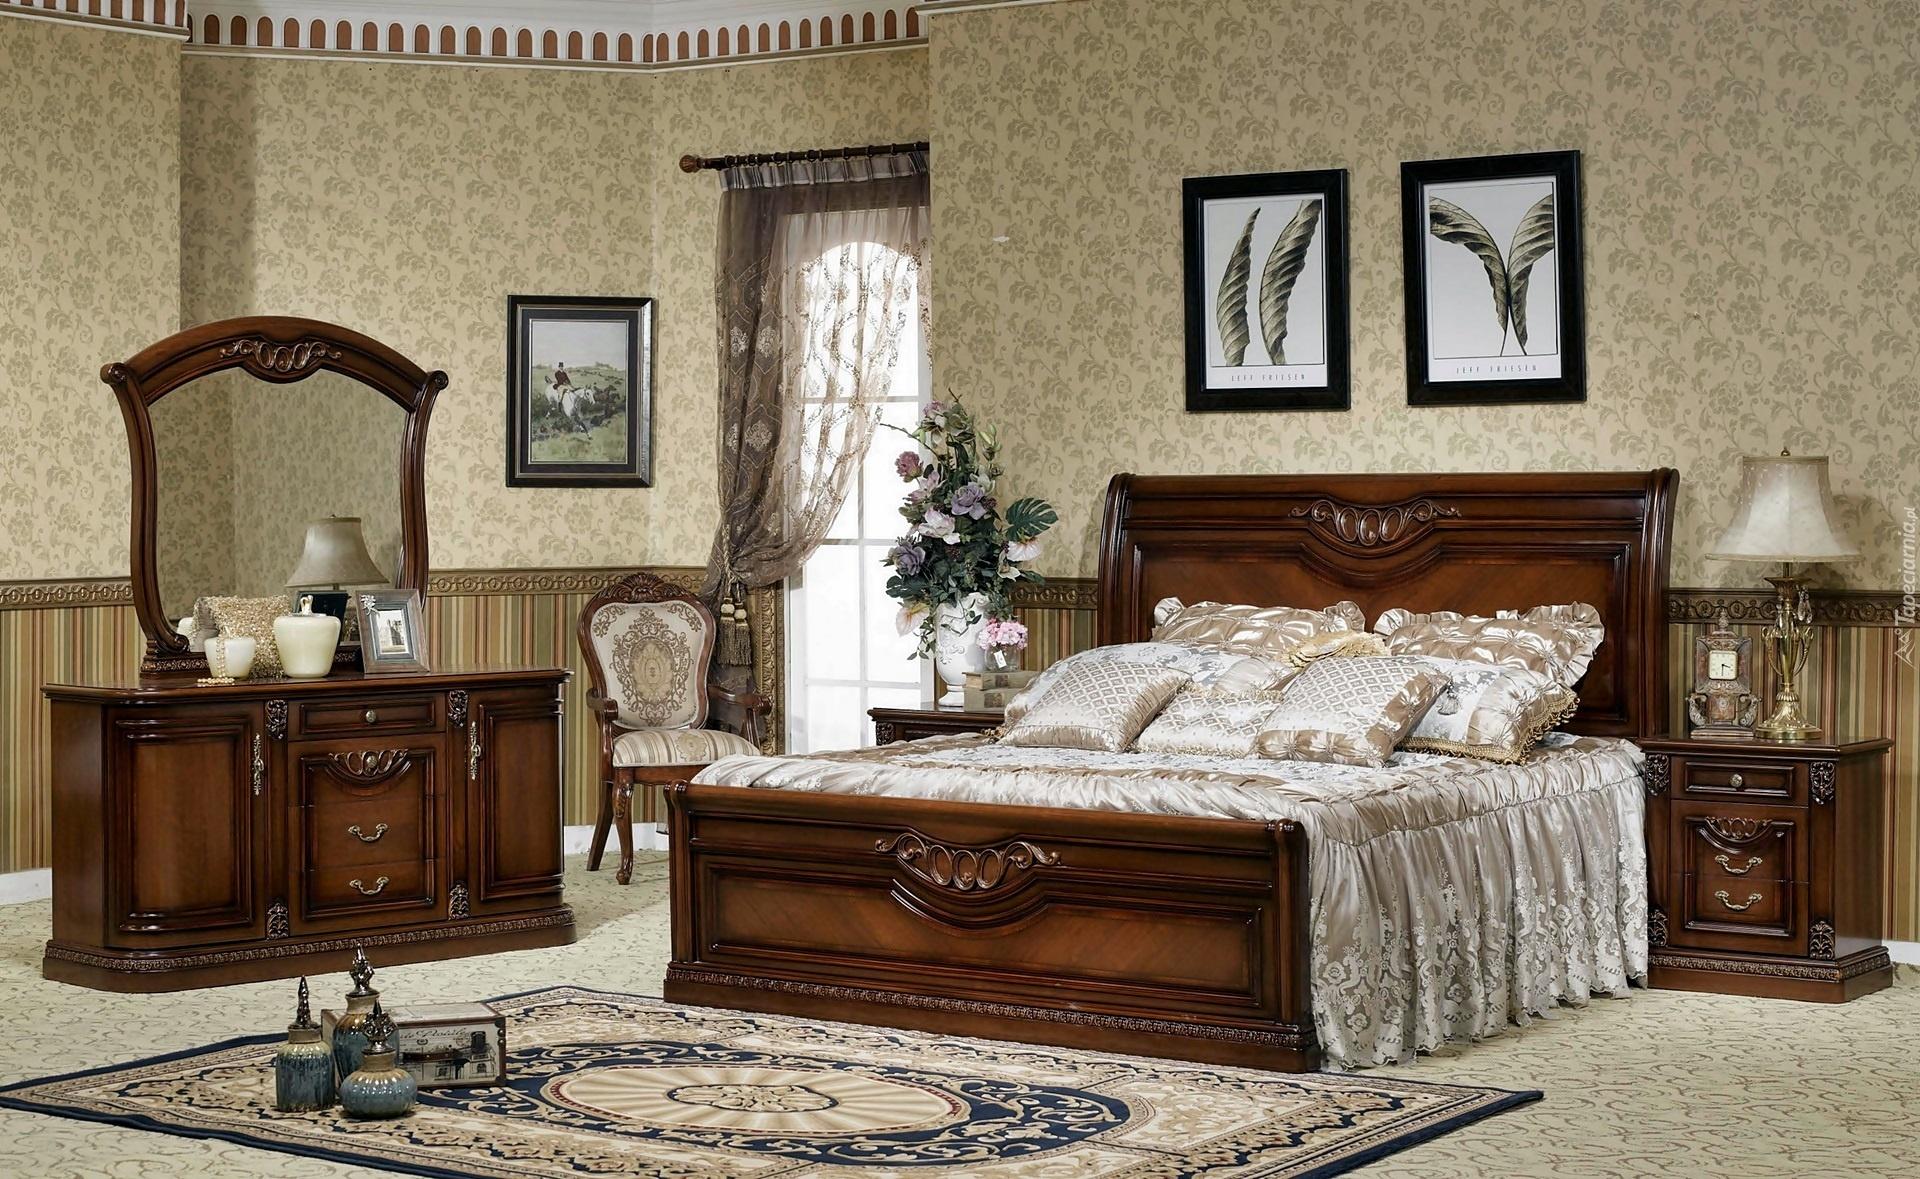 sypialnia  tapeta  sypialnia  Home Decor Furniture i